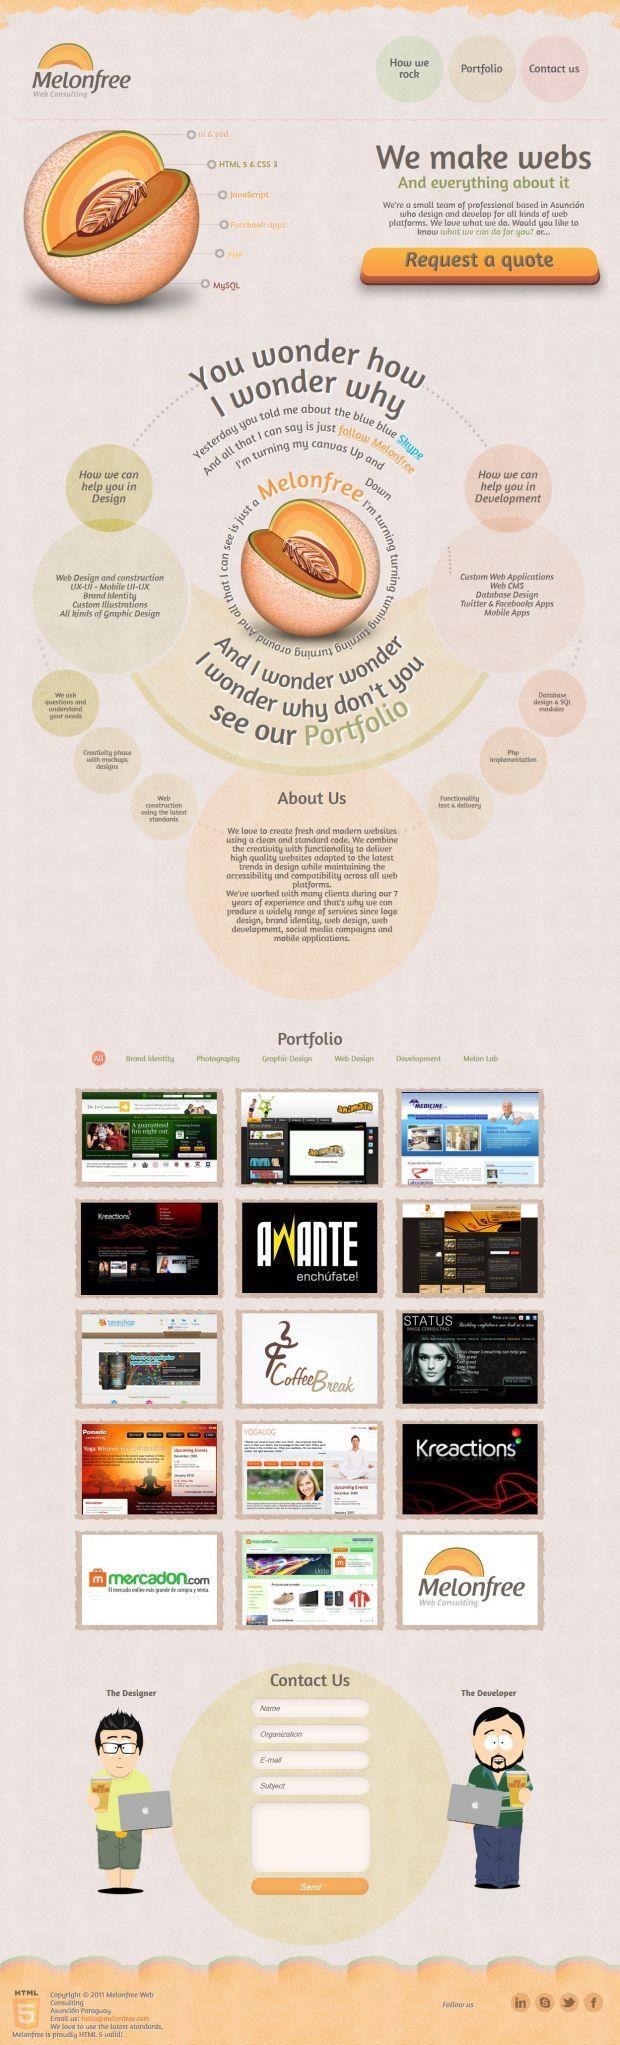 Melonfree Interactive Web Design and Web Development Agency - Best website, web design inspiration showcase